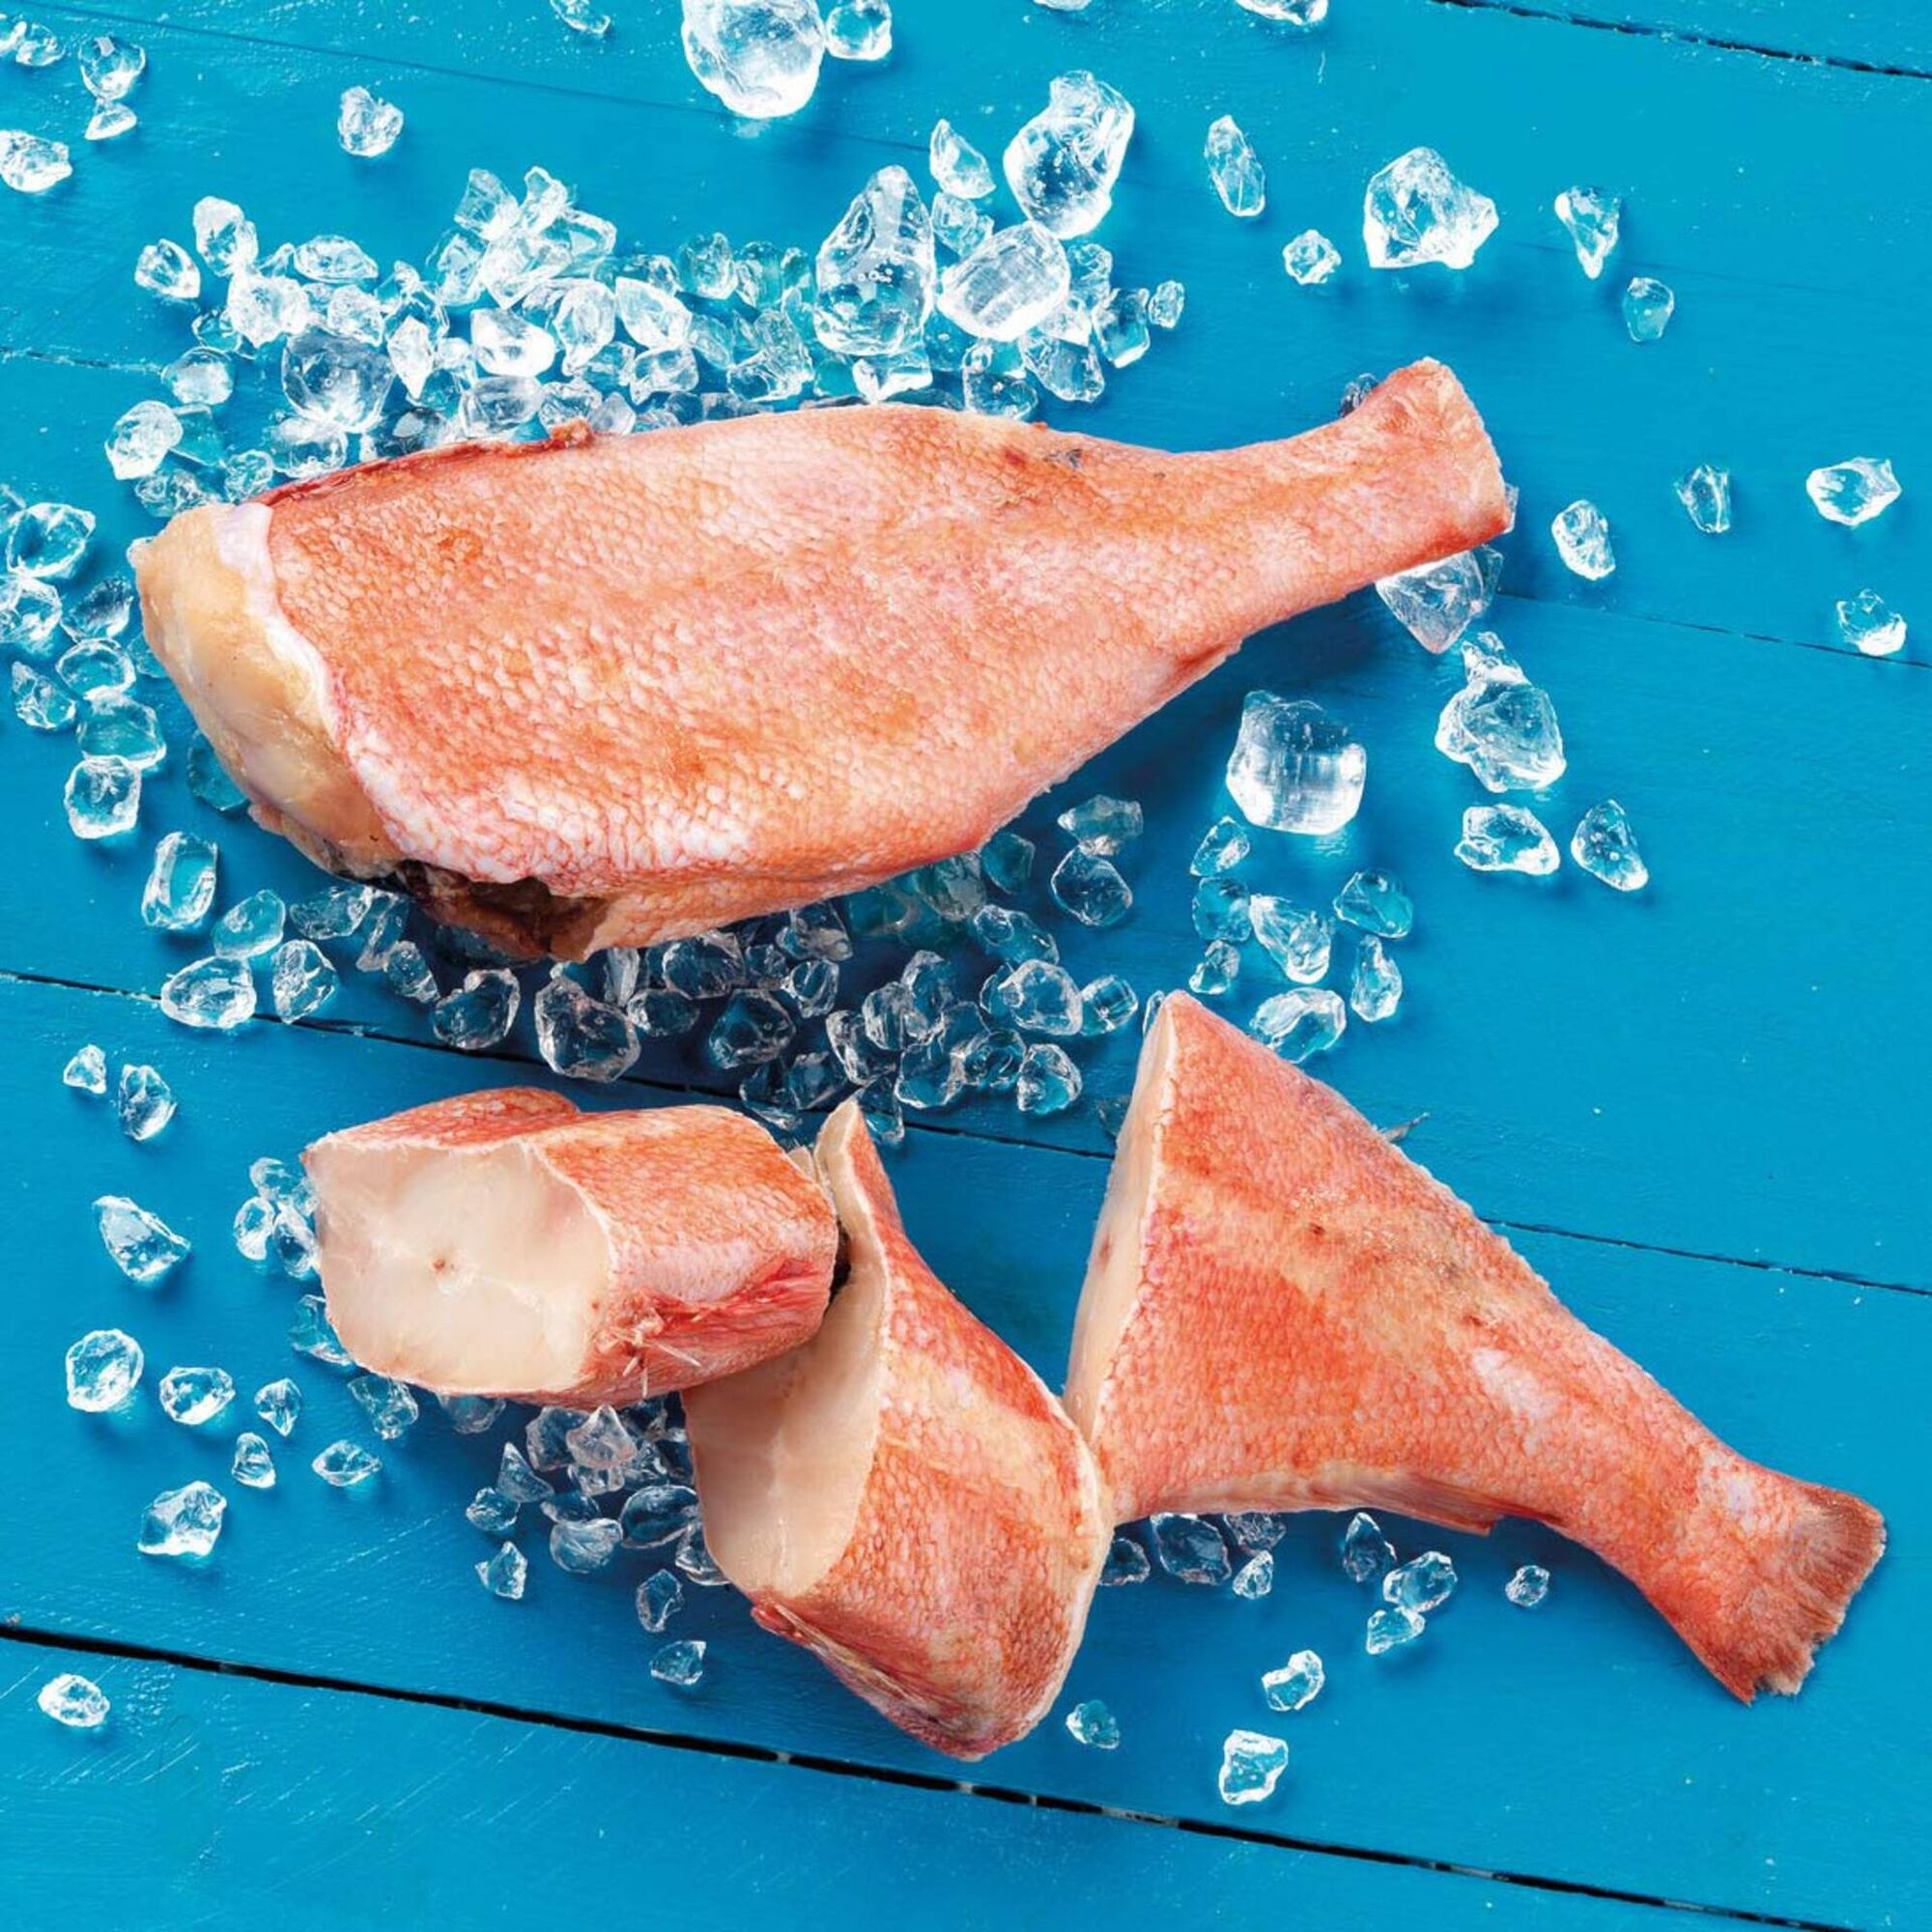 Red Fish Cal 500/700 Congelado